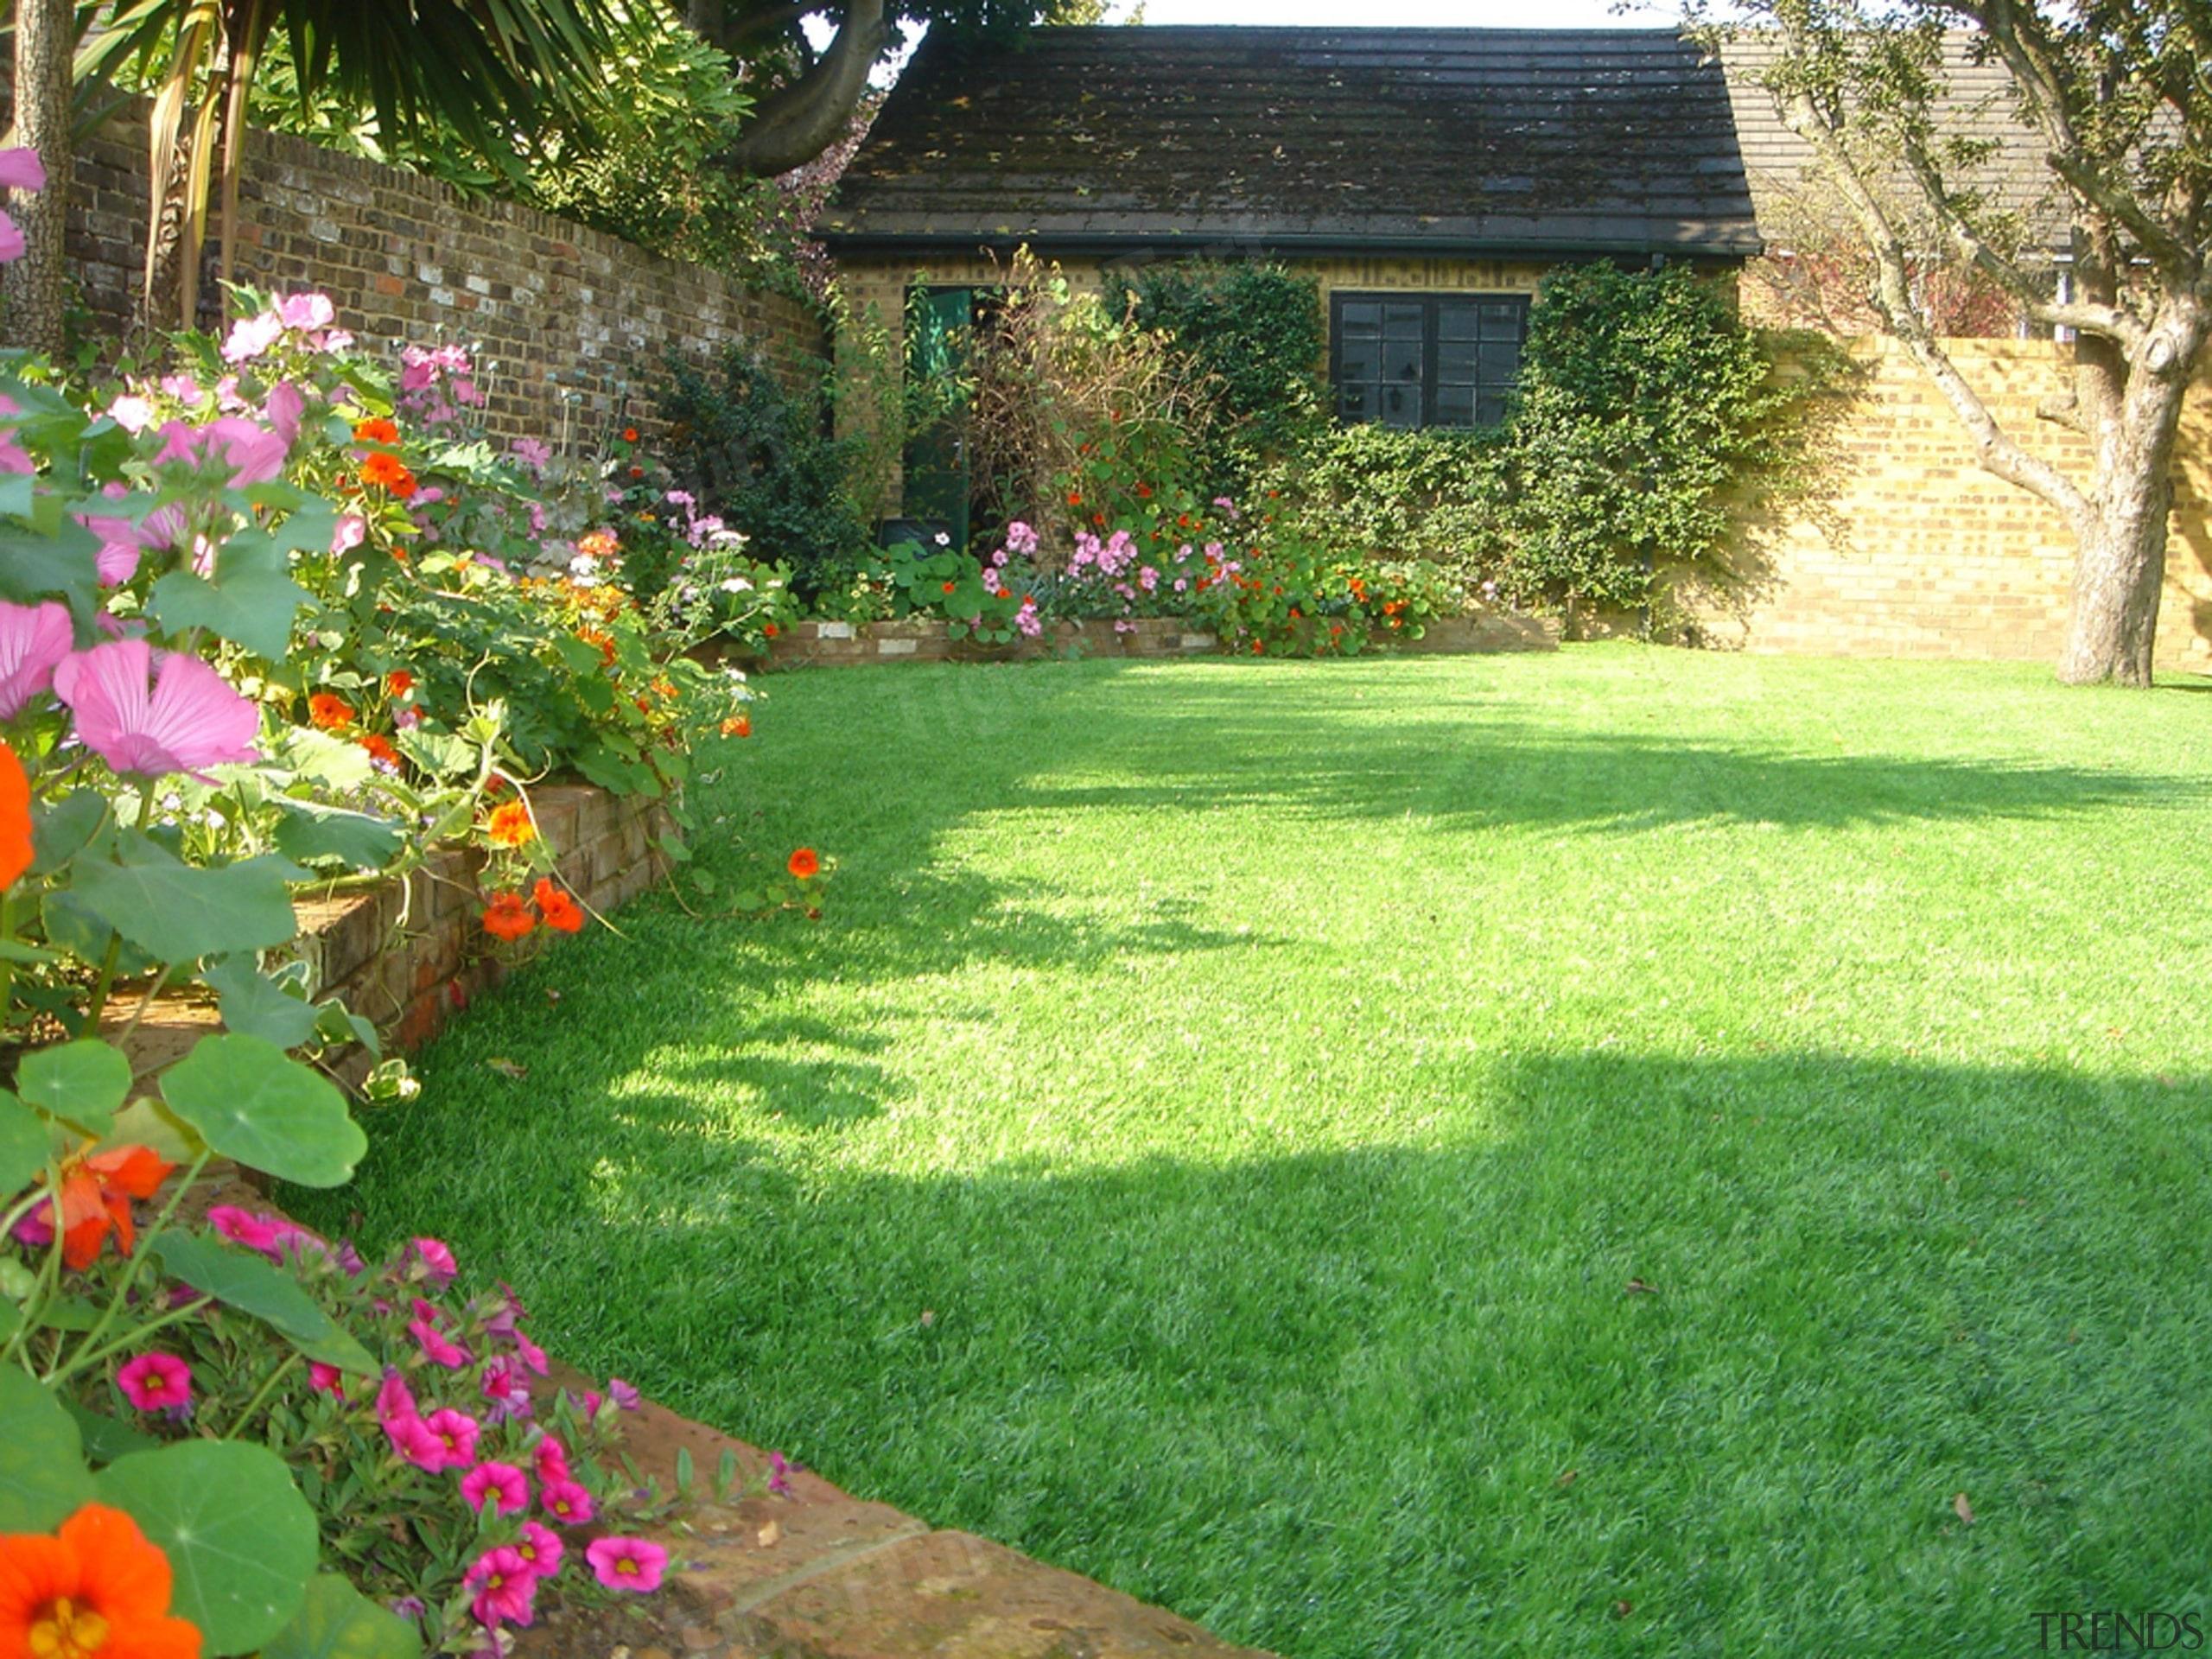 59B48 Wmlandscape4 - backyard | flower | garden backyard, flower, garden, grass, grass family, groundcover, home, house, landscape, landscaping, lawn, plant, property, shrub, yard, green